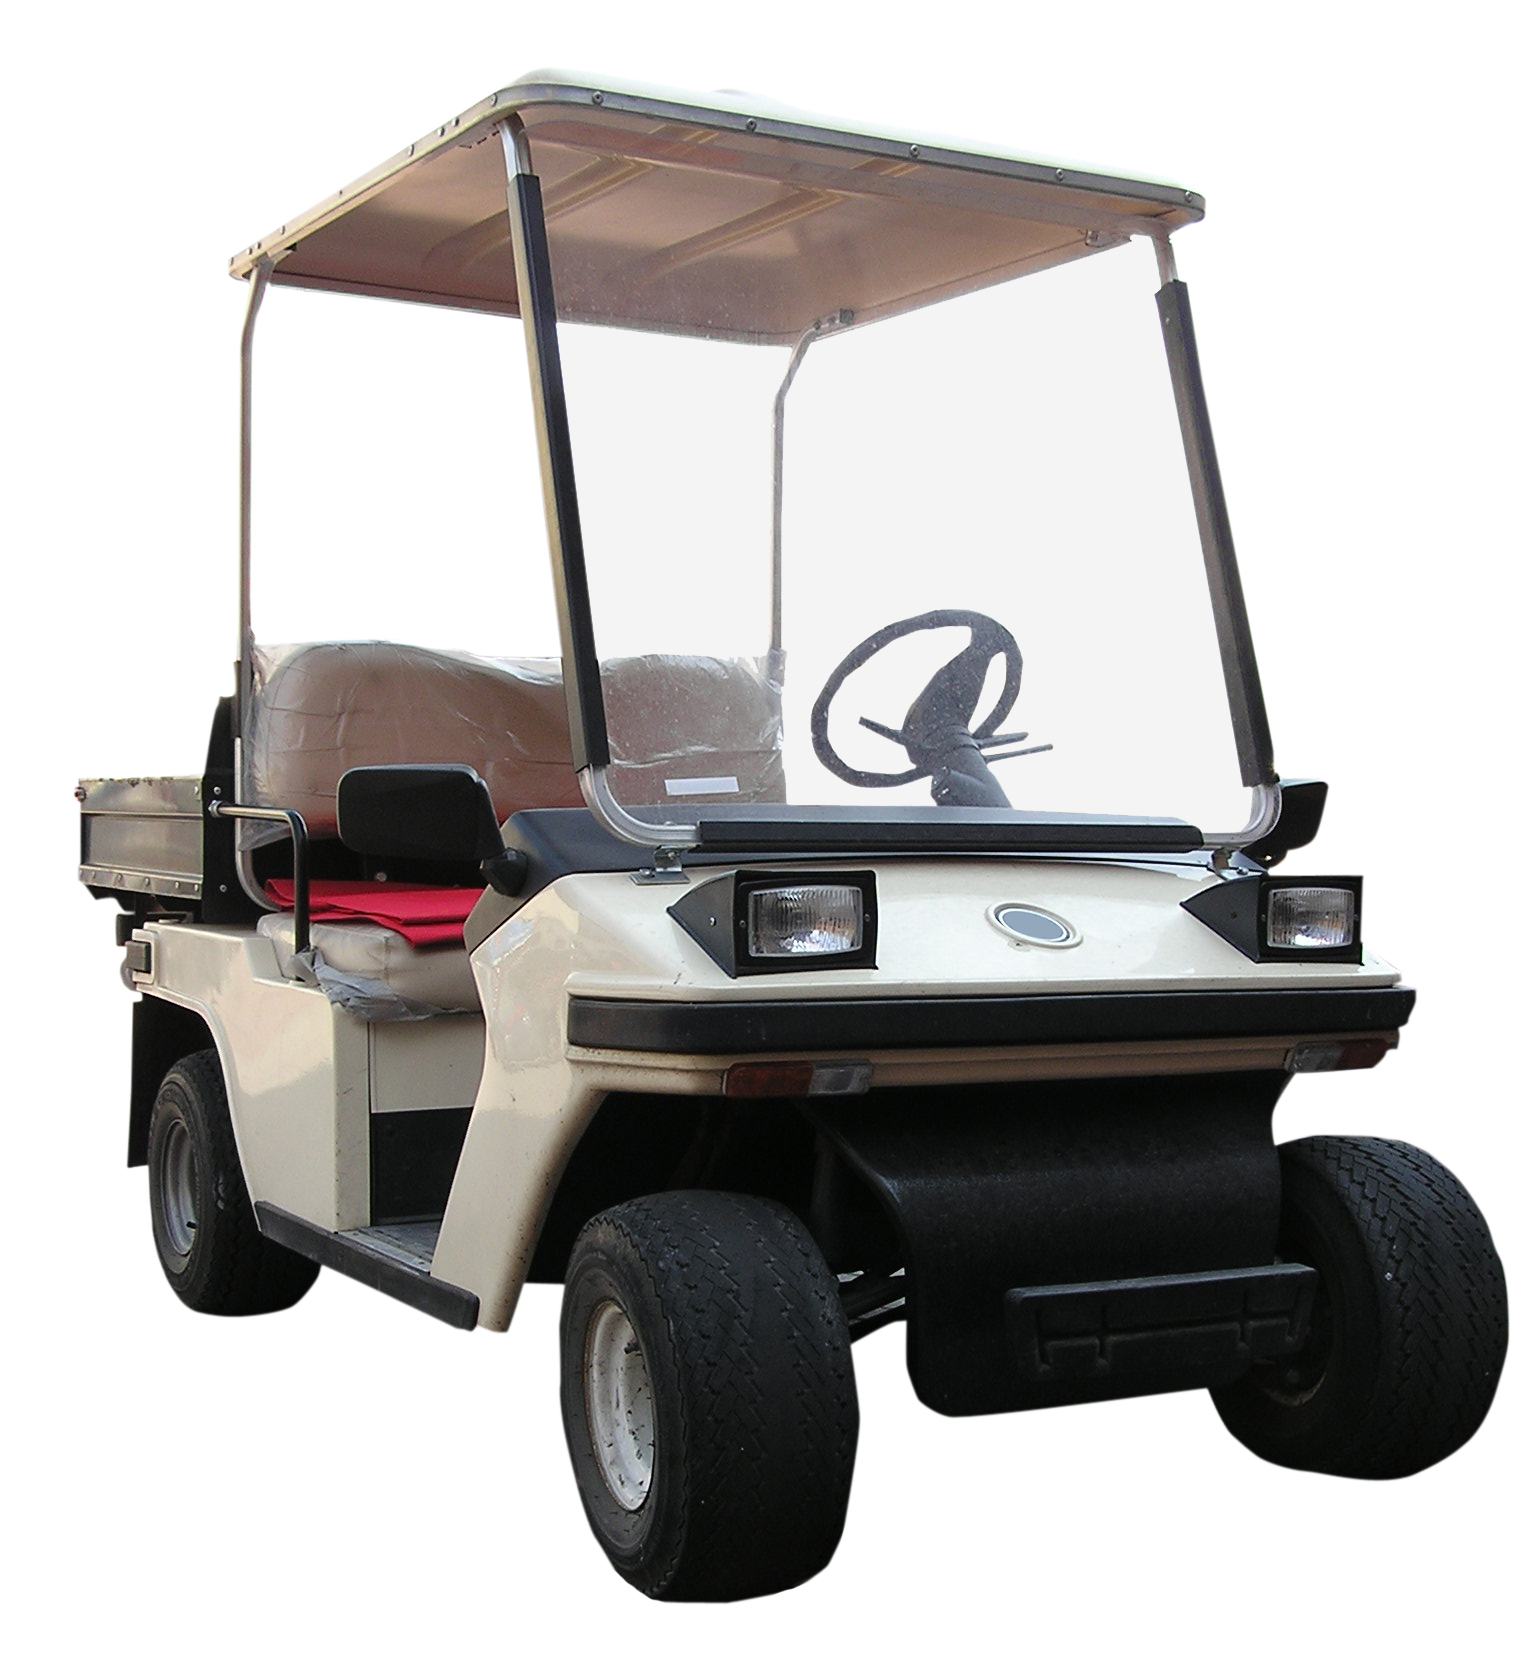 yamaha g2 golf cart wiring diagram images moreover wiring diagram yamaha golf cart governor adjustment car wiring diagram clubgolfcar